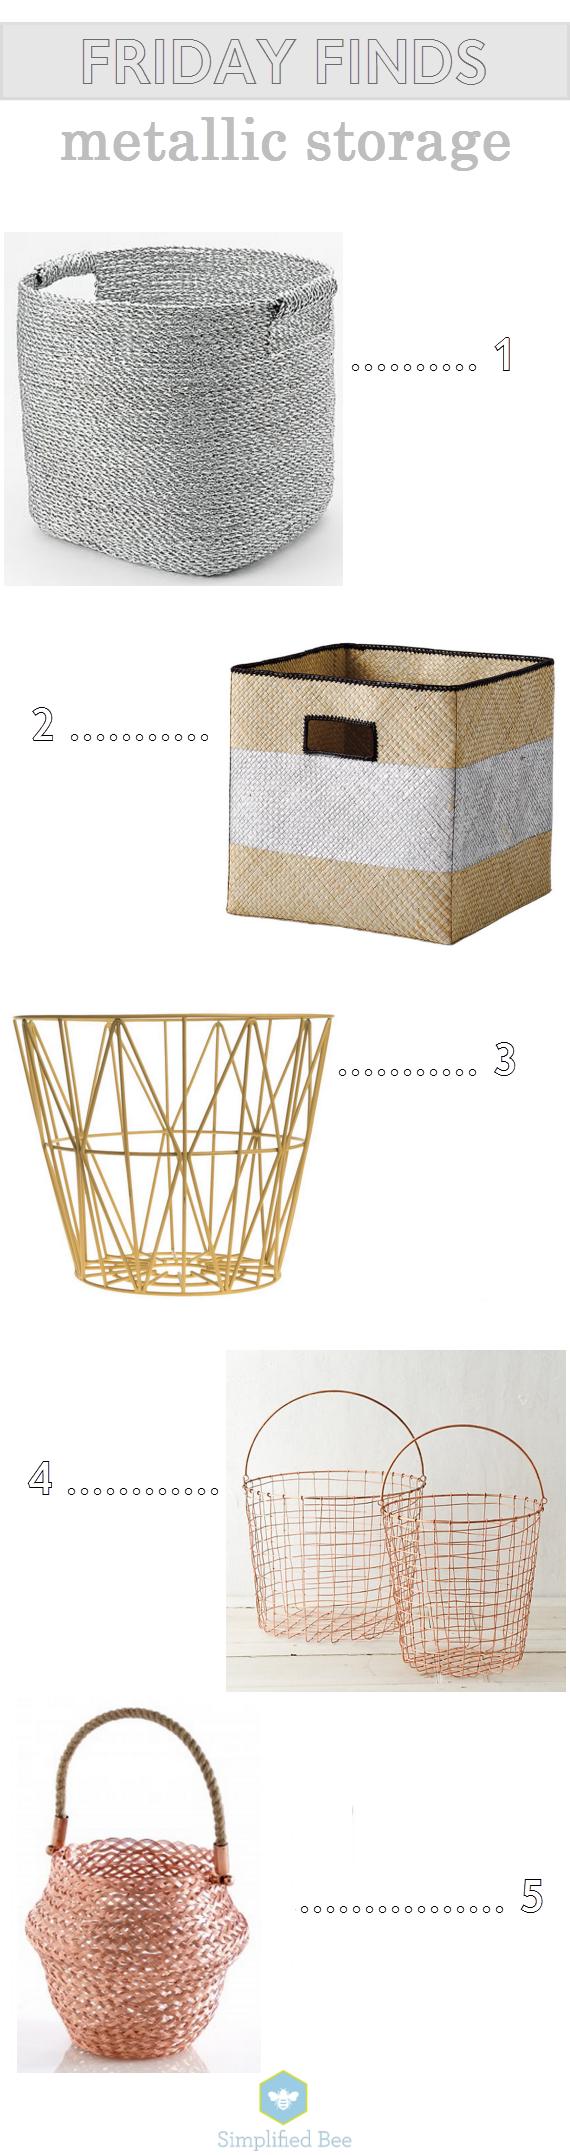 metallic storage bins & baskets // simplifiedbee.com